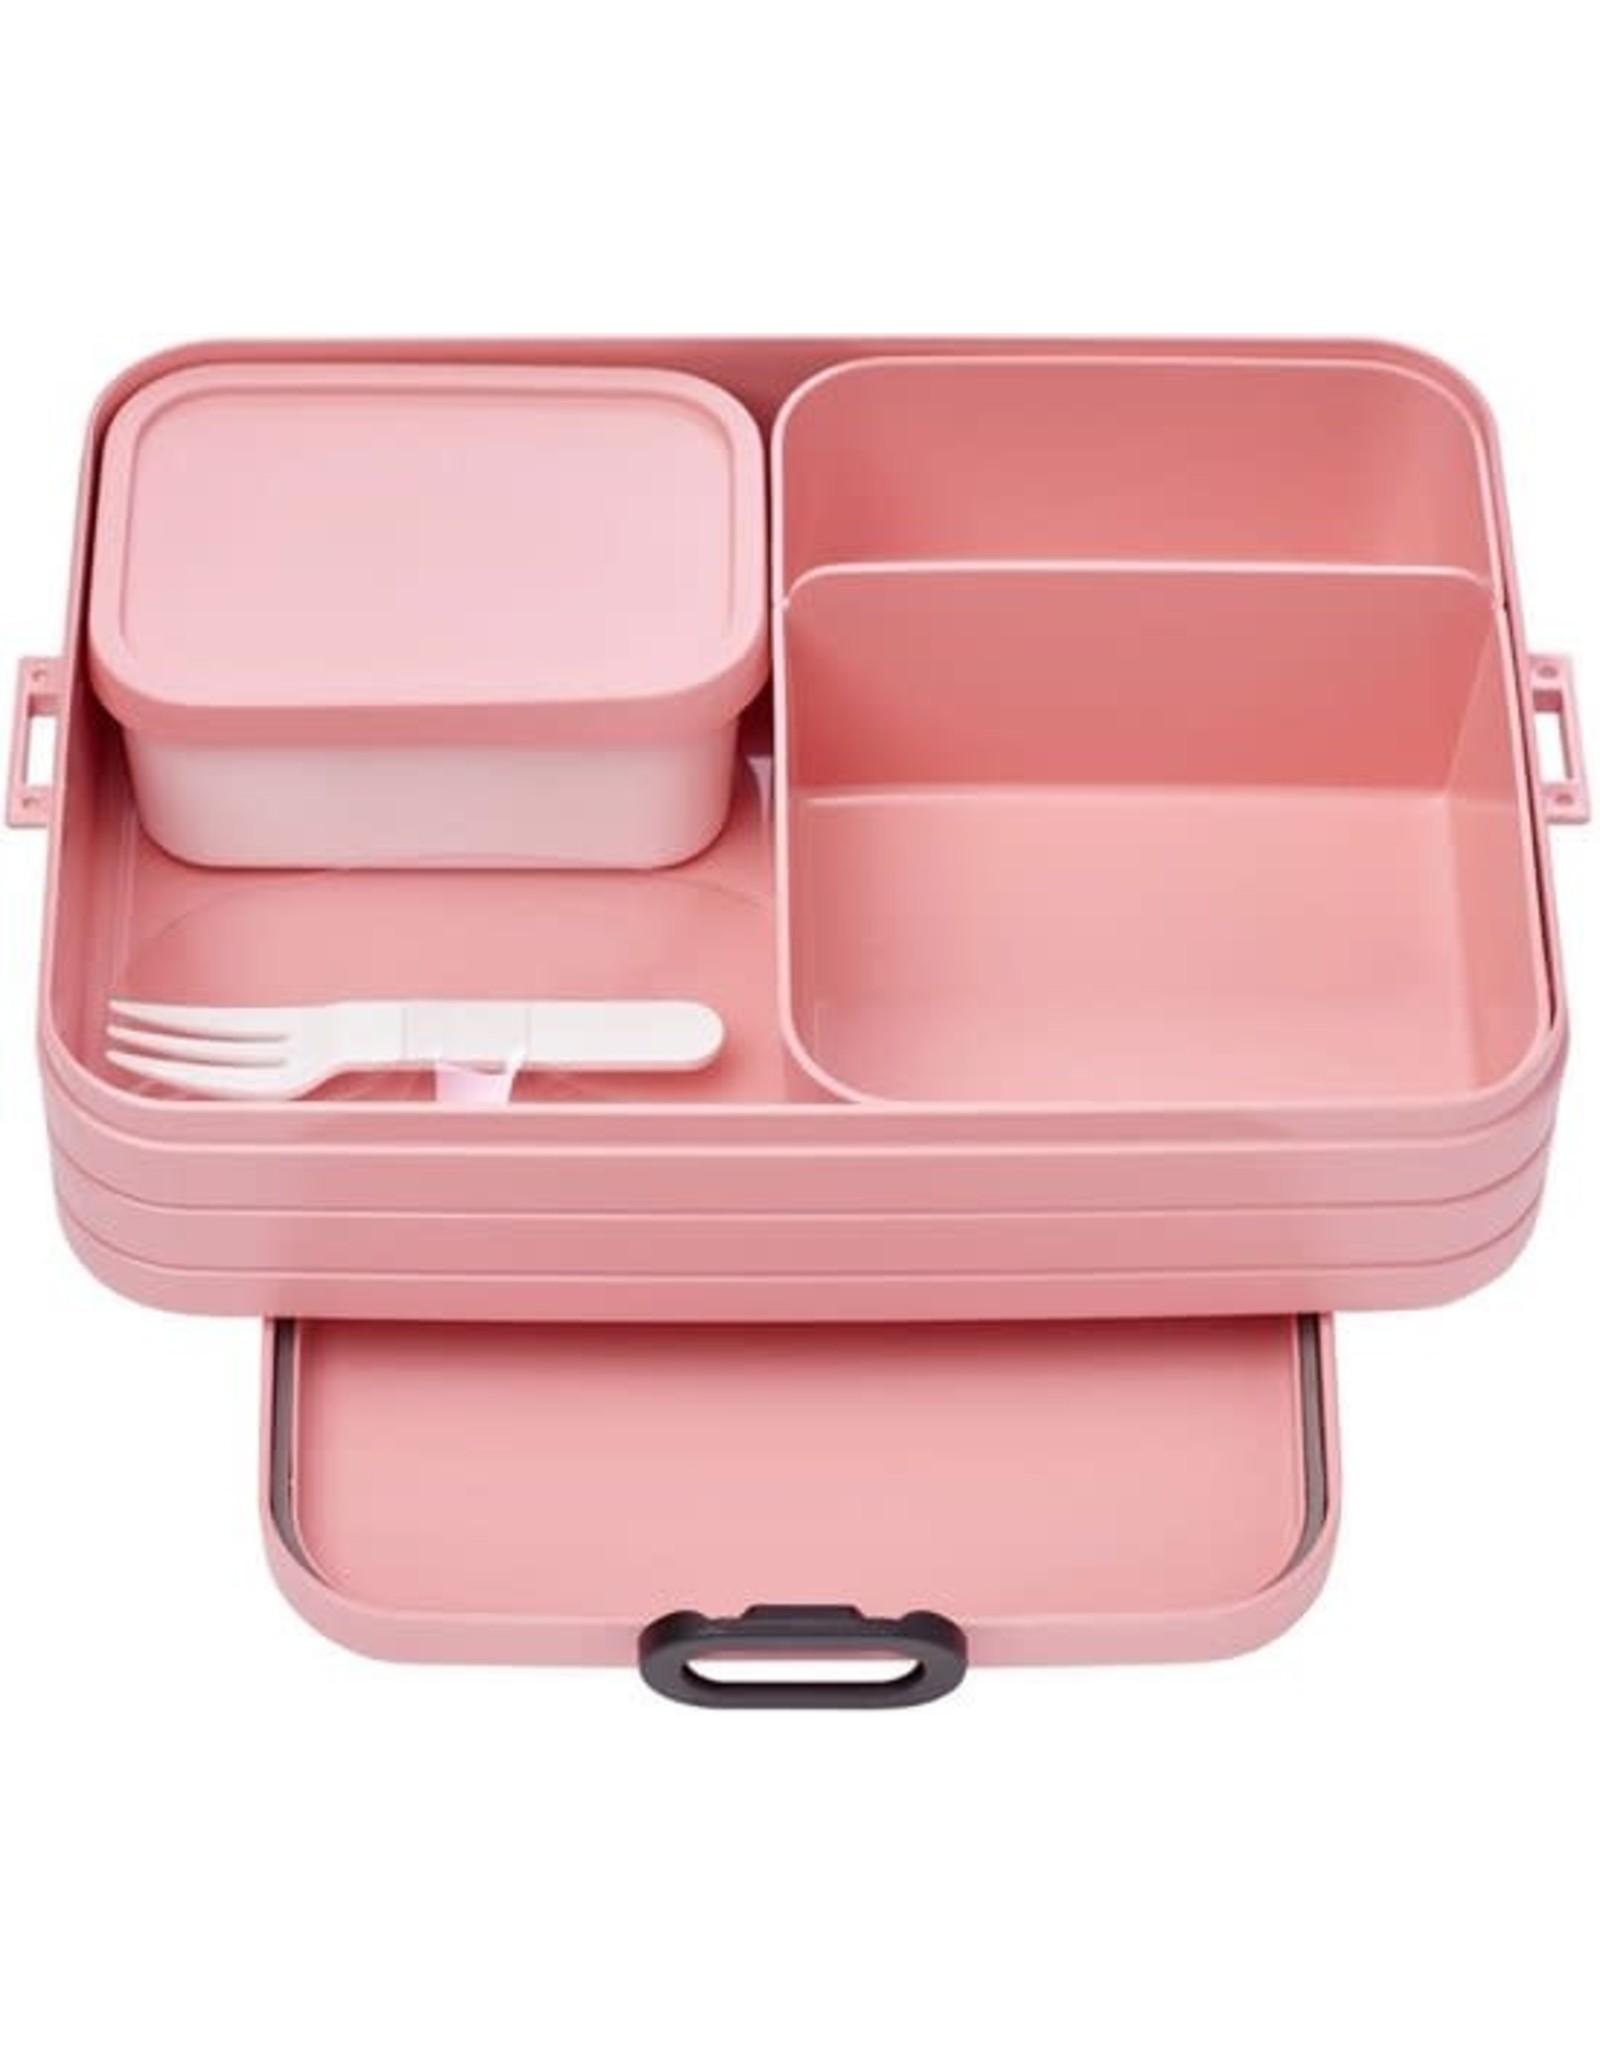 Bento lunchbox Take a Break large - Nordic pink